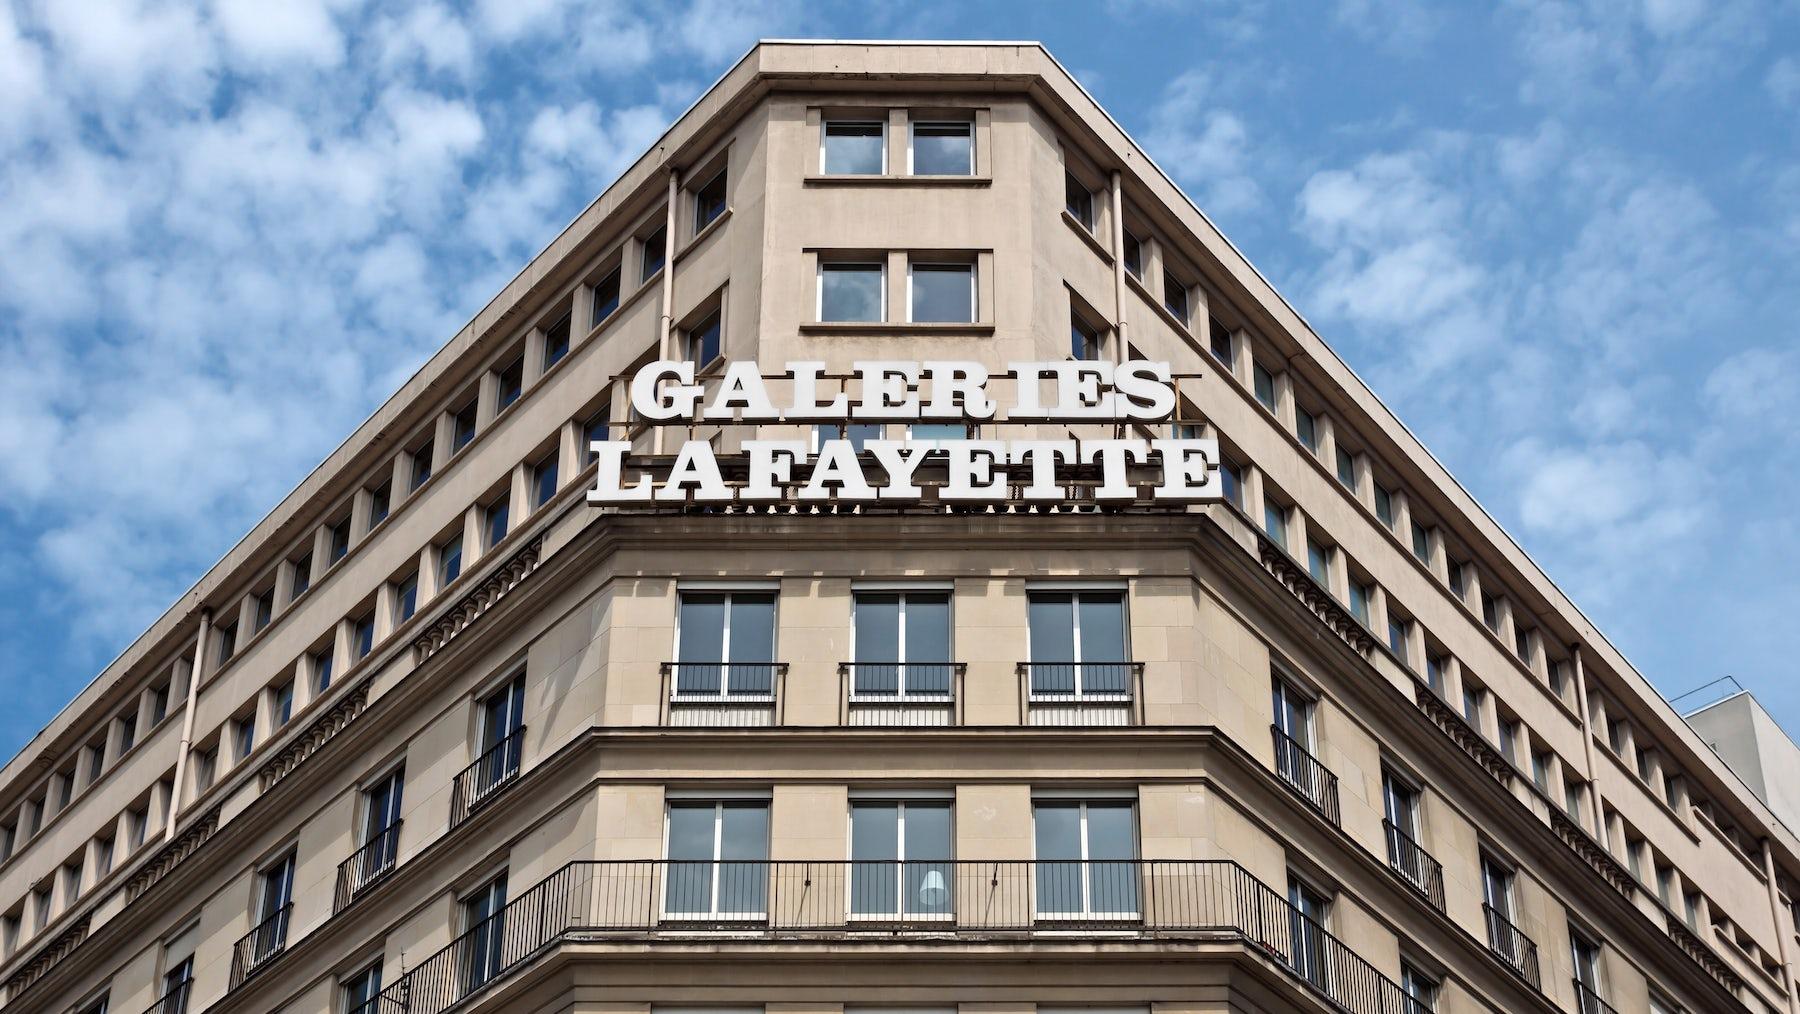 Galeries Lafayette   Source: Shutterstock